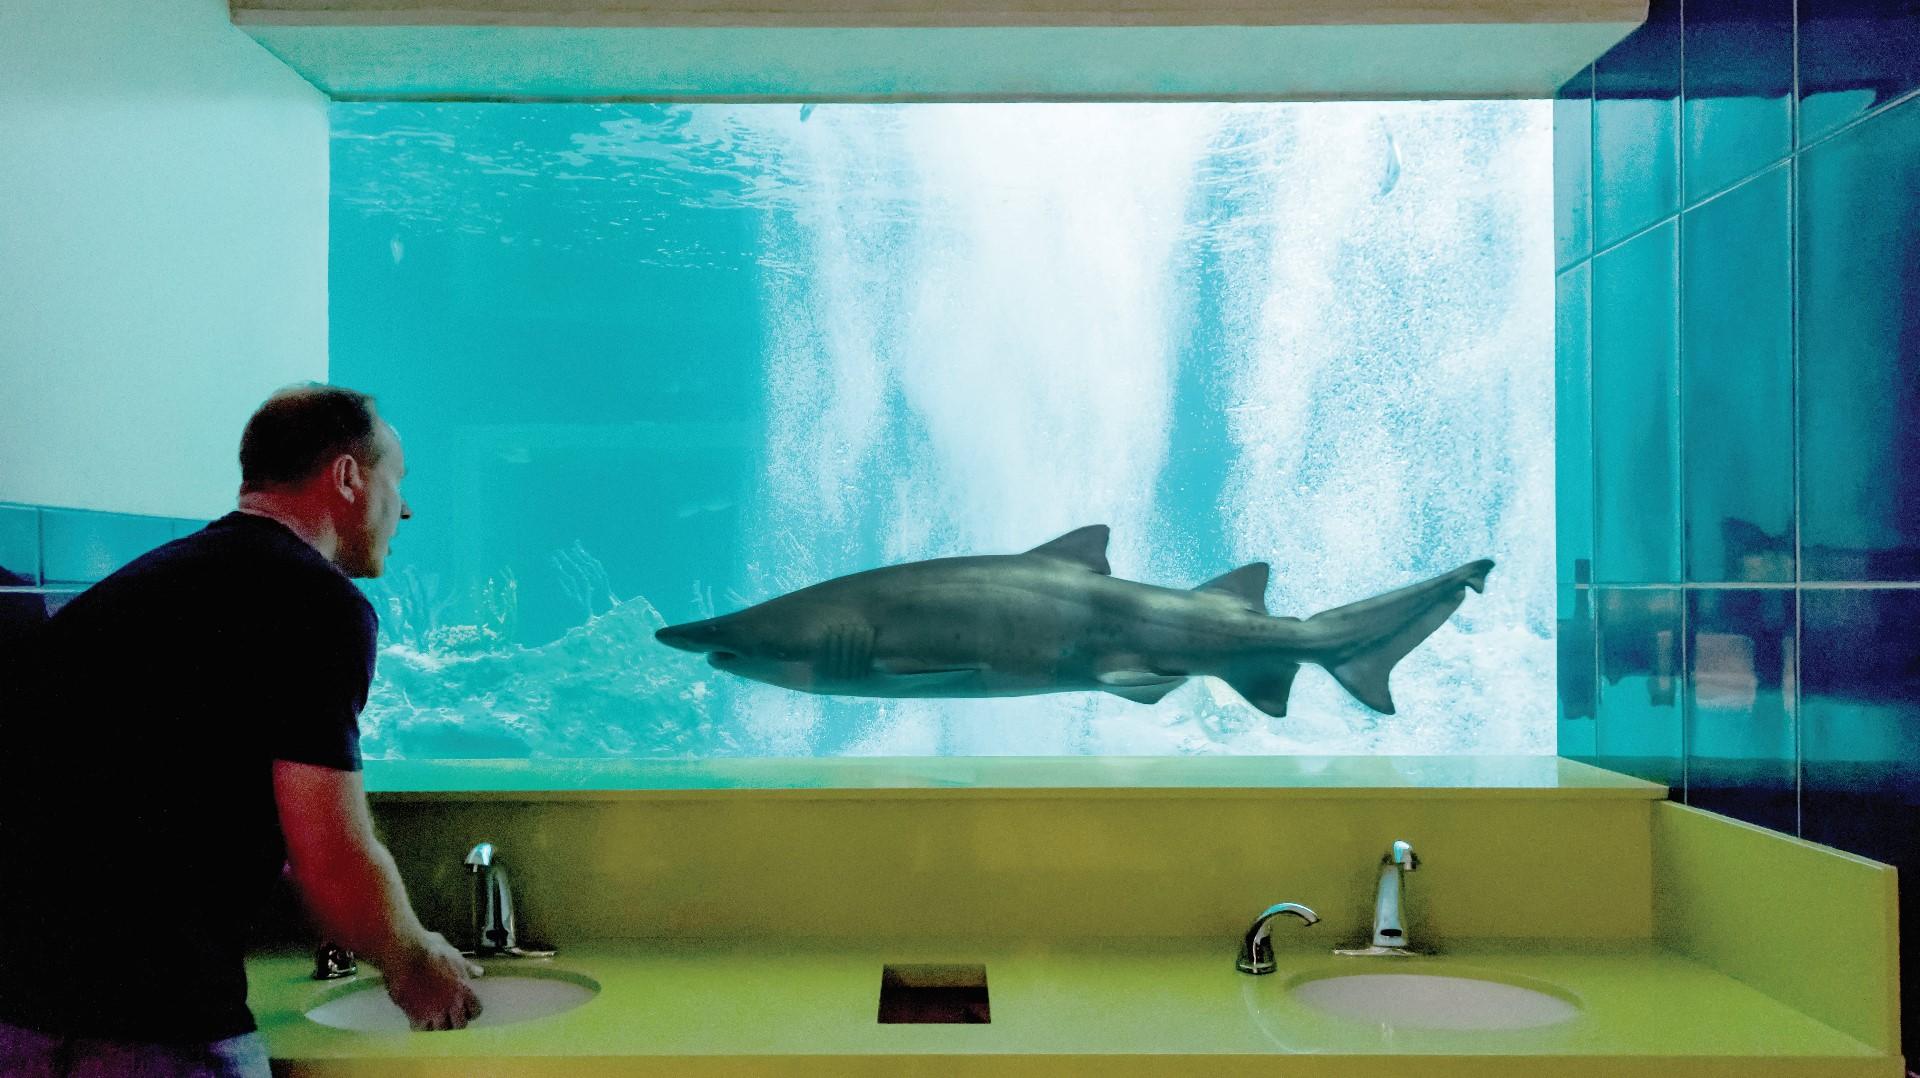 Scottsdale s OdySea Aquarium has the best bathroom in America  company says    12NEWS com. Scottsdale s OdySea Aquarium has the best bathroom in America